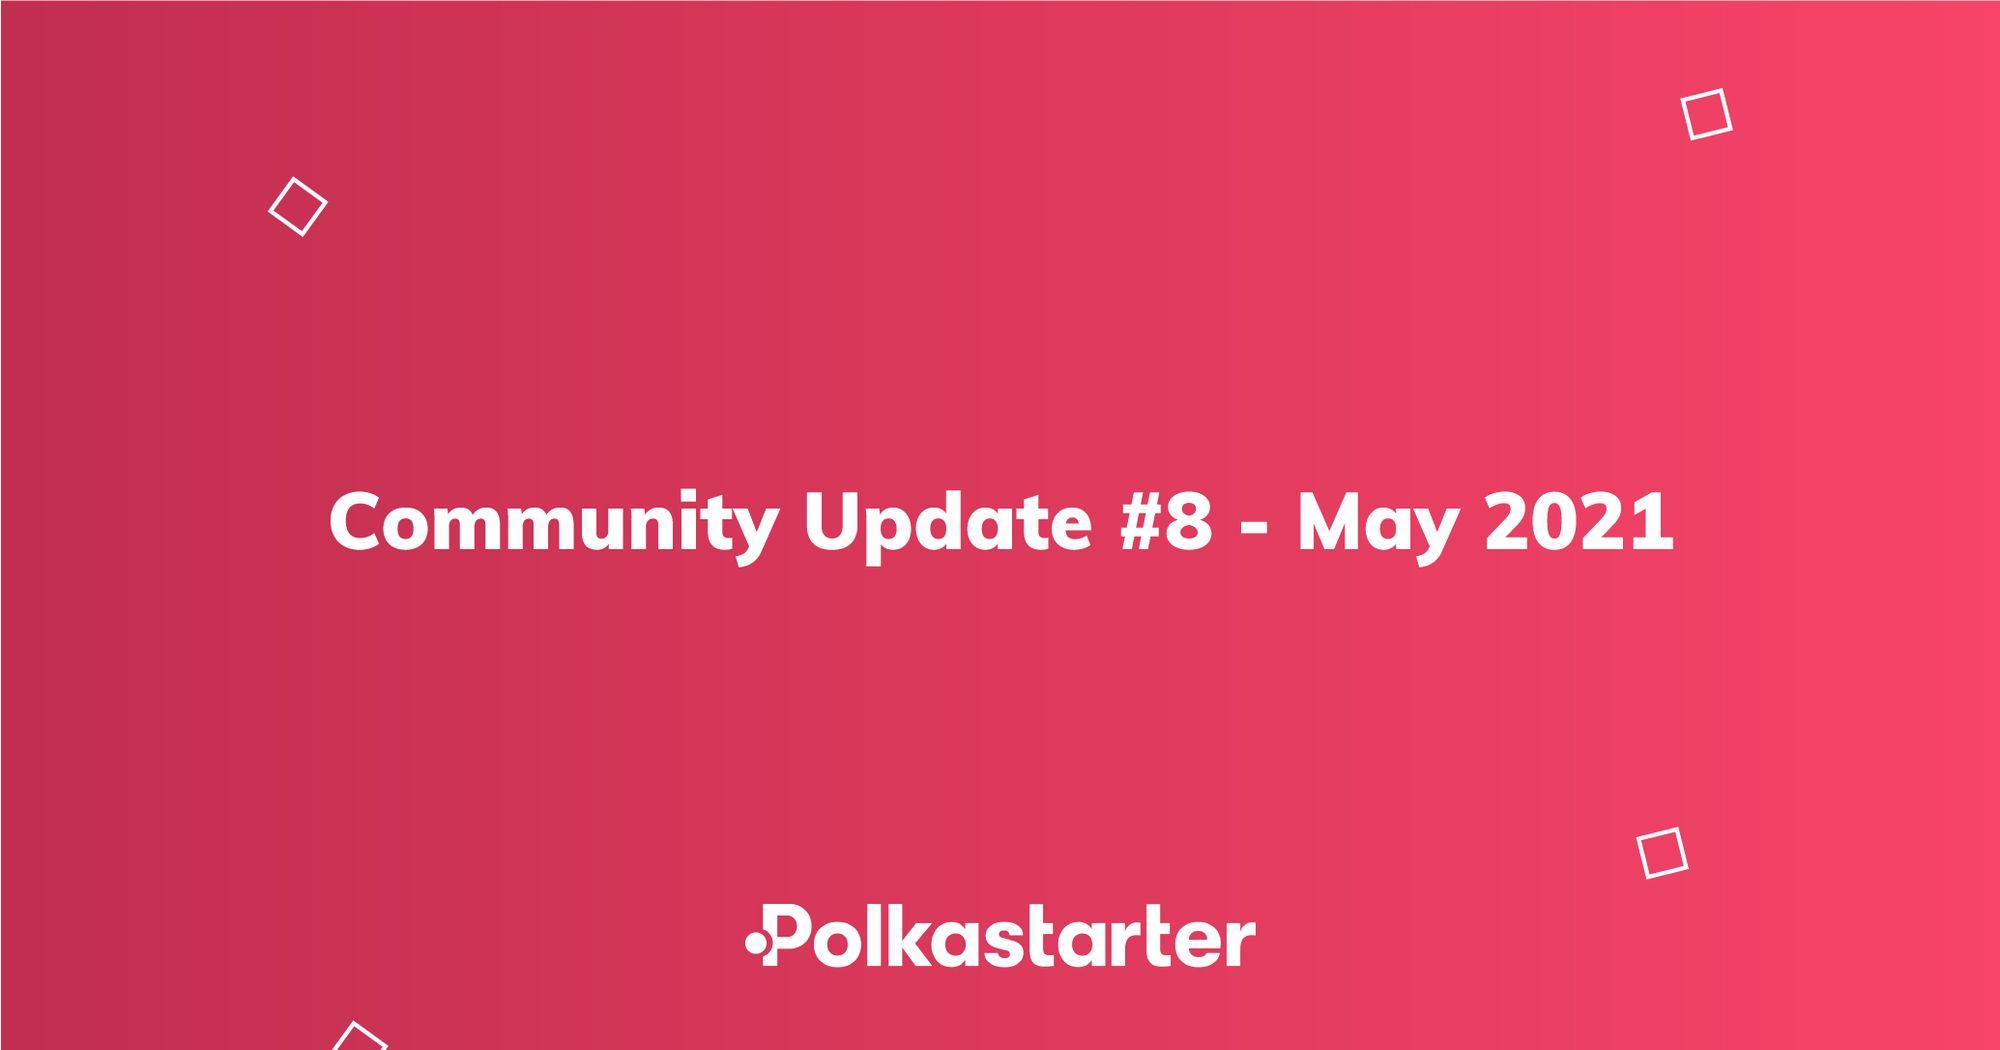 Polkastarter Community Update #8 - May 2021